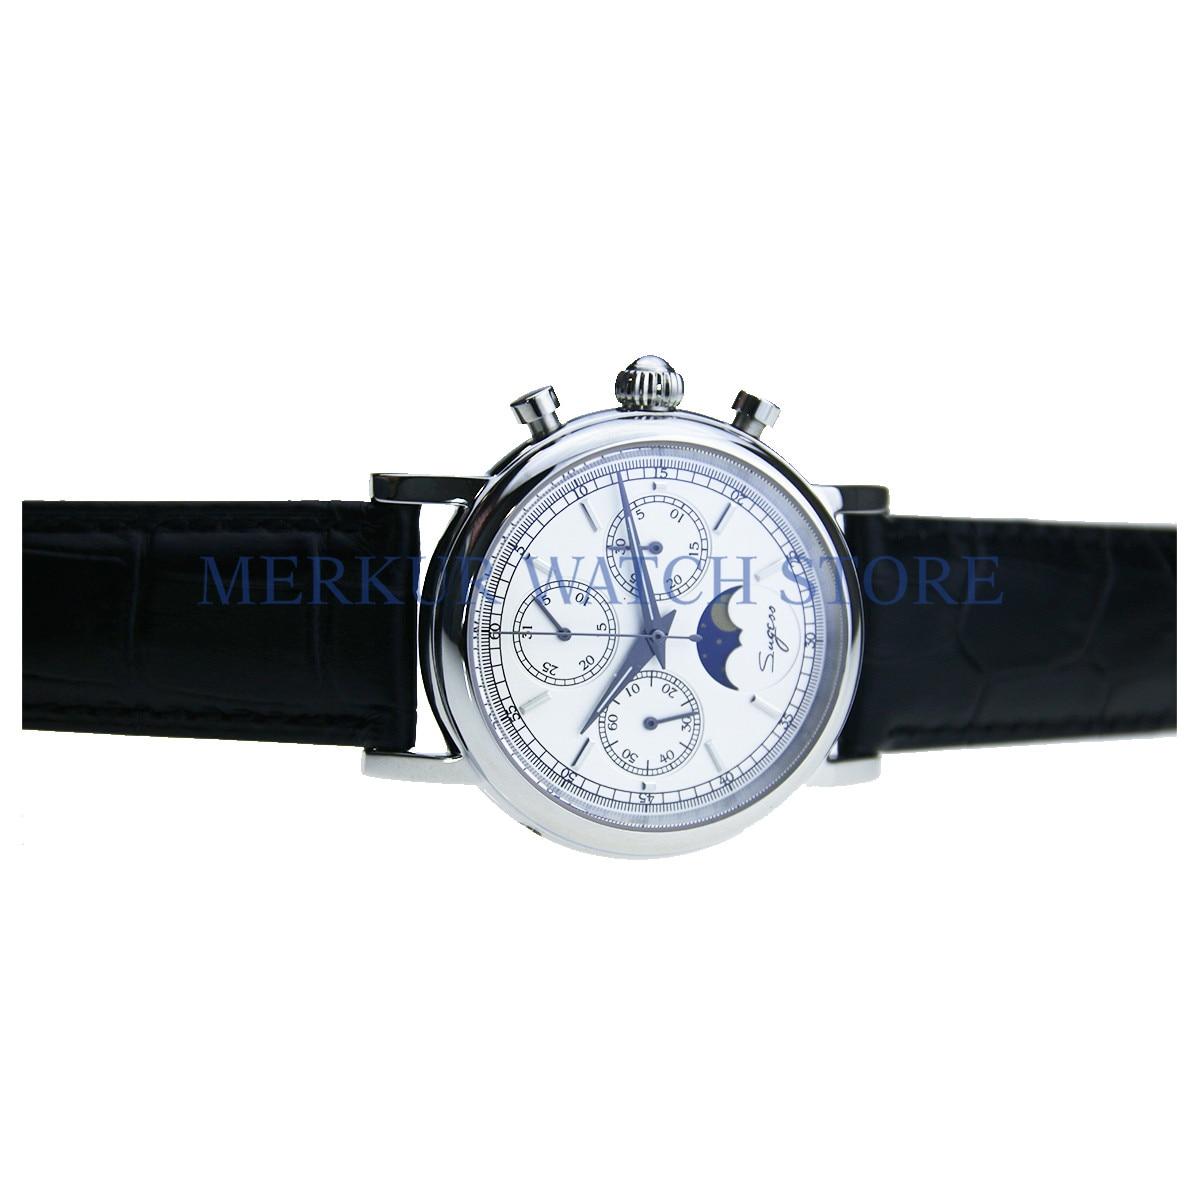 Sugess Luminour TianJin movimiento Moonphase calendario mecánico para hombre reloj cronógrafo de lujo